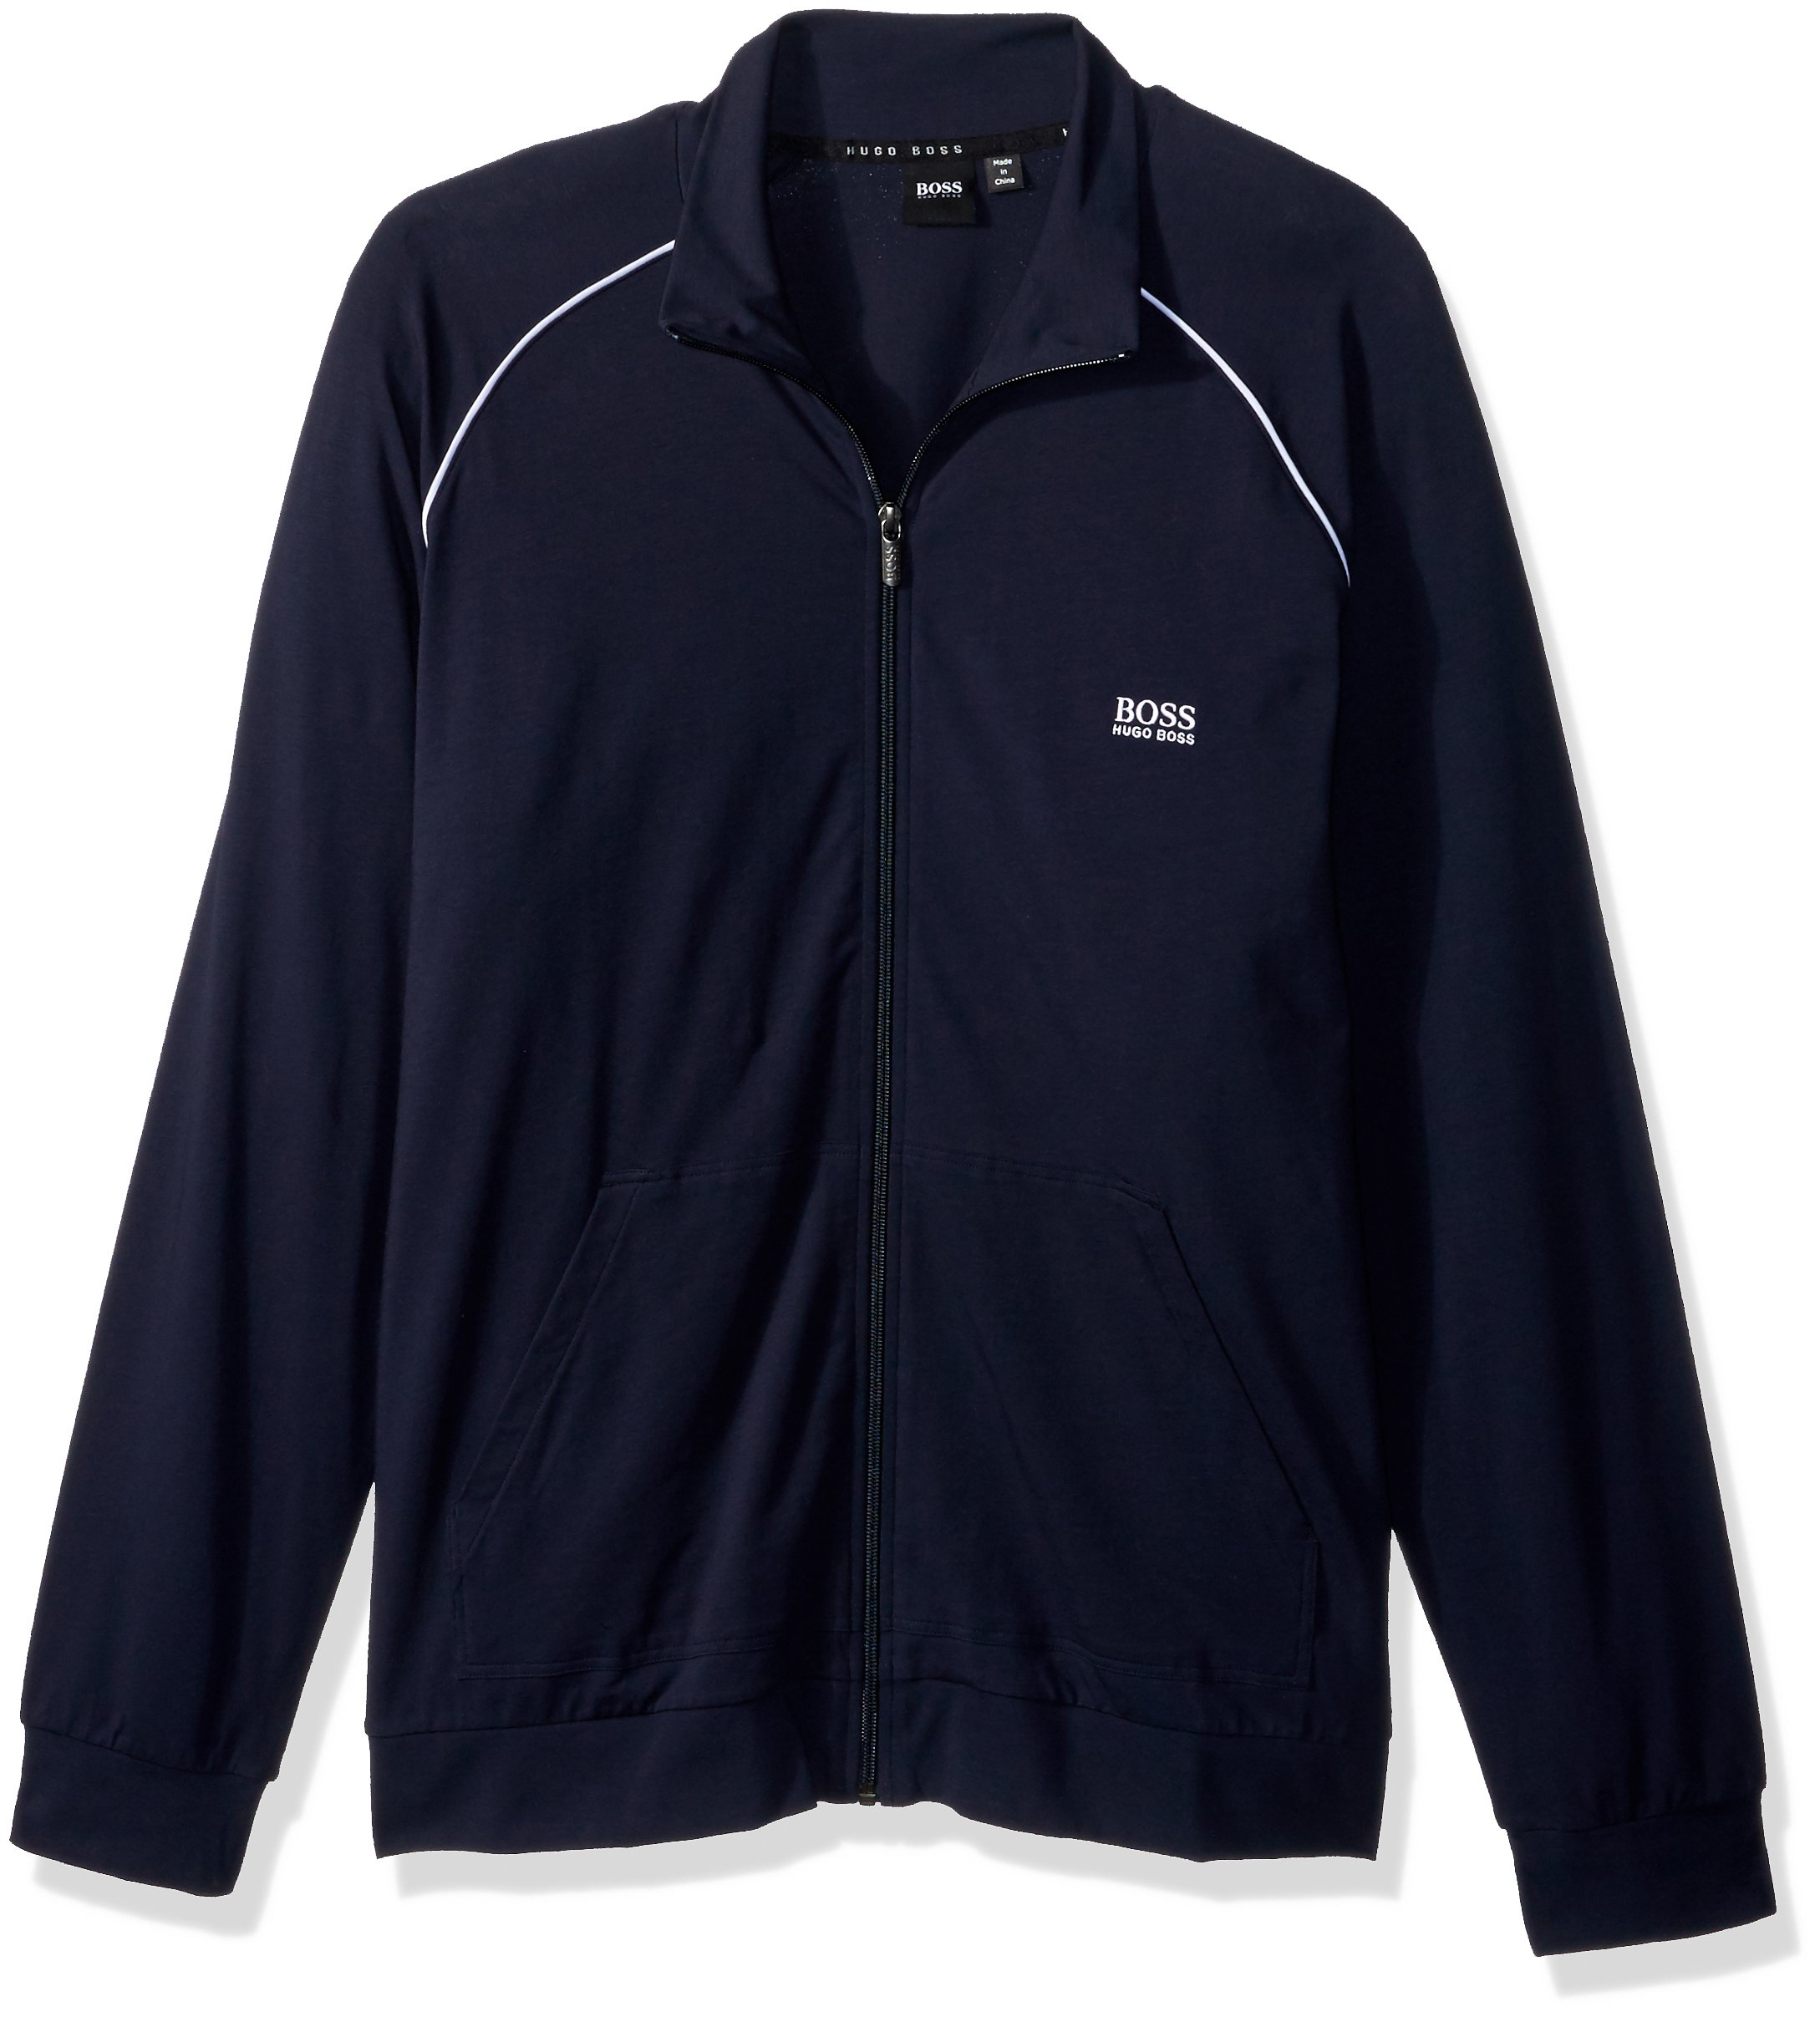 Hugo Boss Boss Men's Mix&Match Jacket Z 10143871 01, Open Blue, L by Hugo Boss